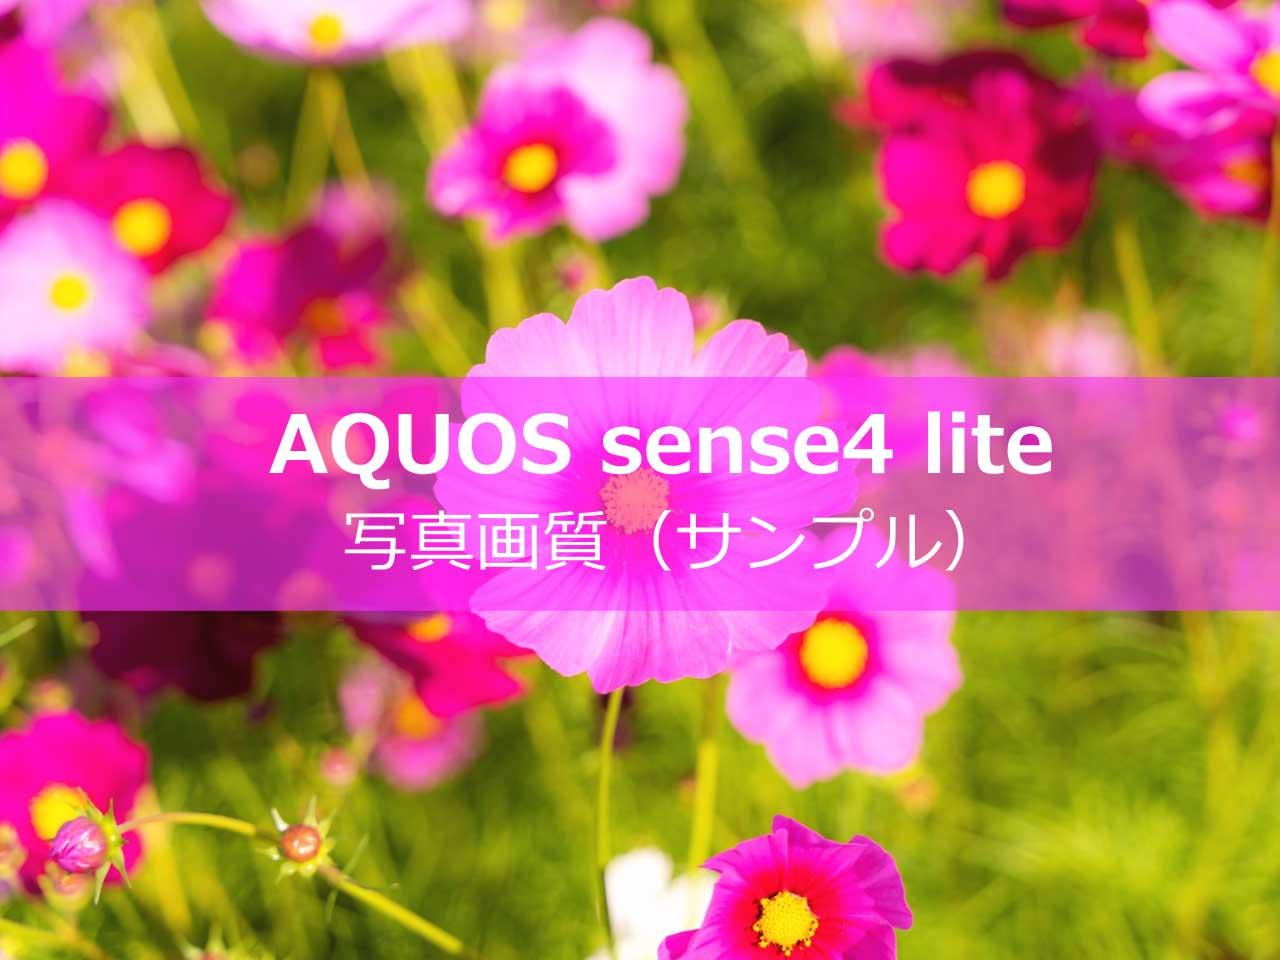 AQUOS sense4 liteで撮影した写真